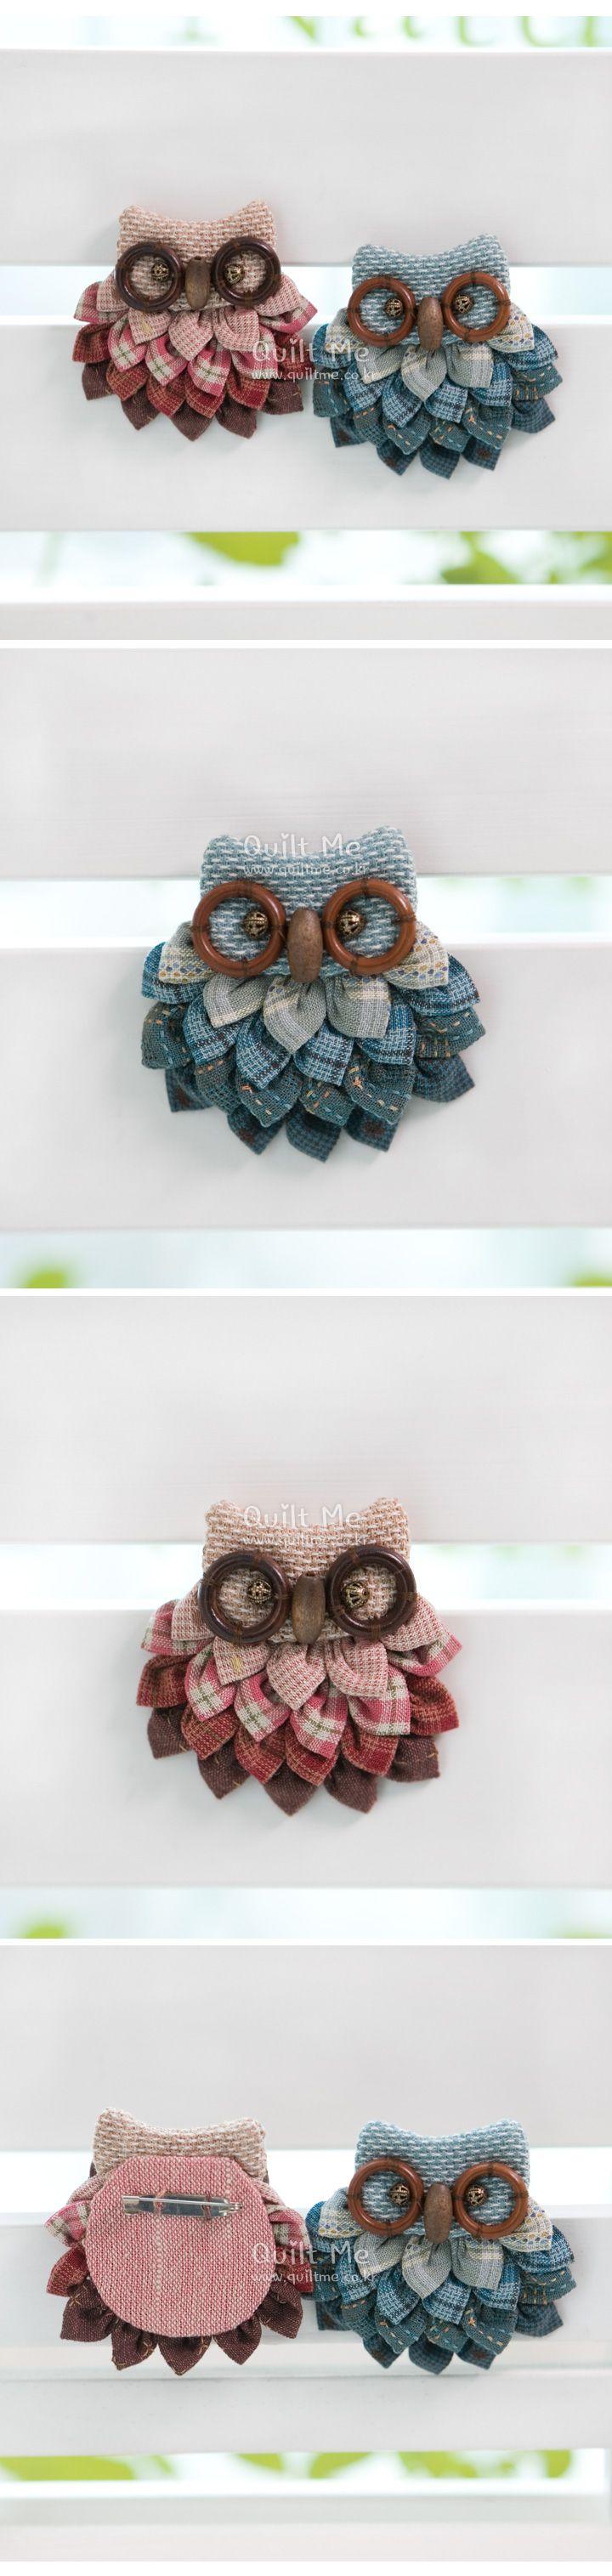 Pin de brigitte en couture | Pinterest | Broches, Lechuzas y Costura